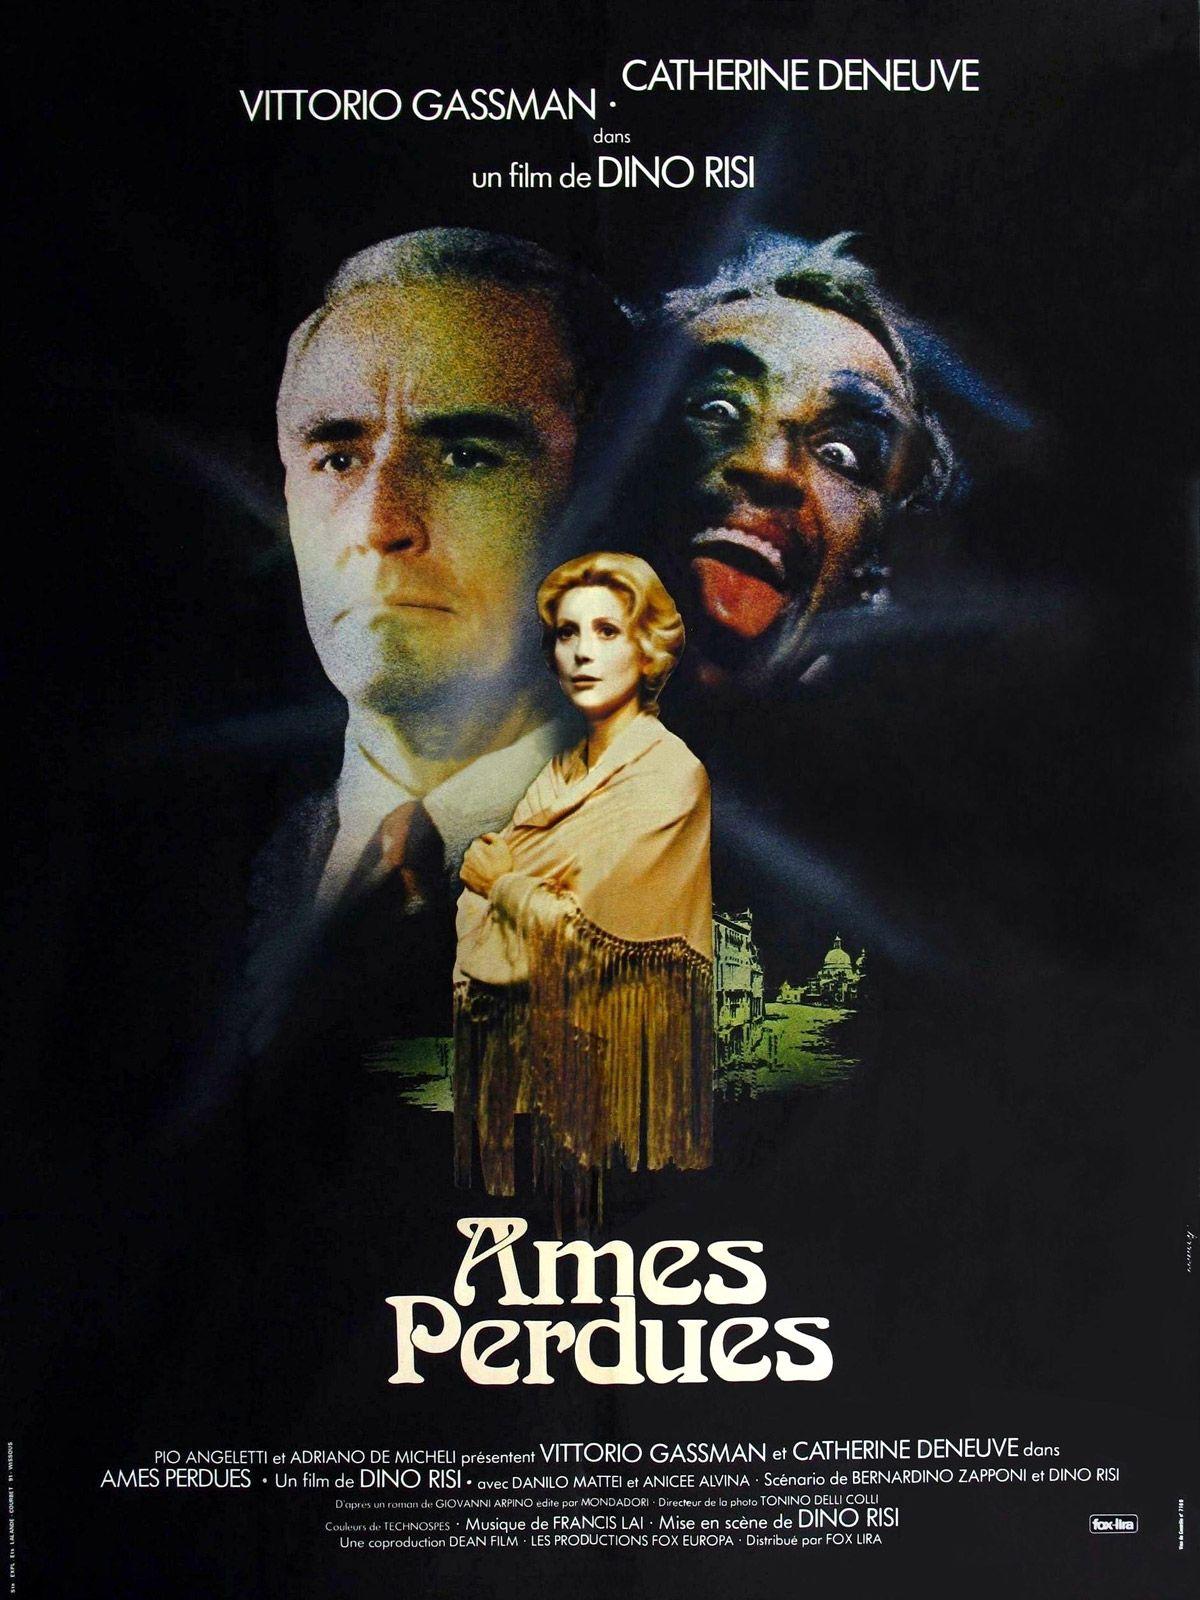 Anima Persa 1977 anima persa' (1977); regia: dino risi. titolo francese